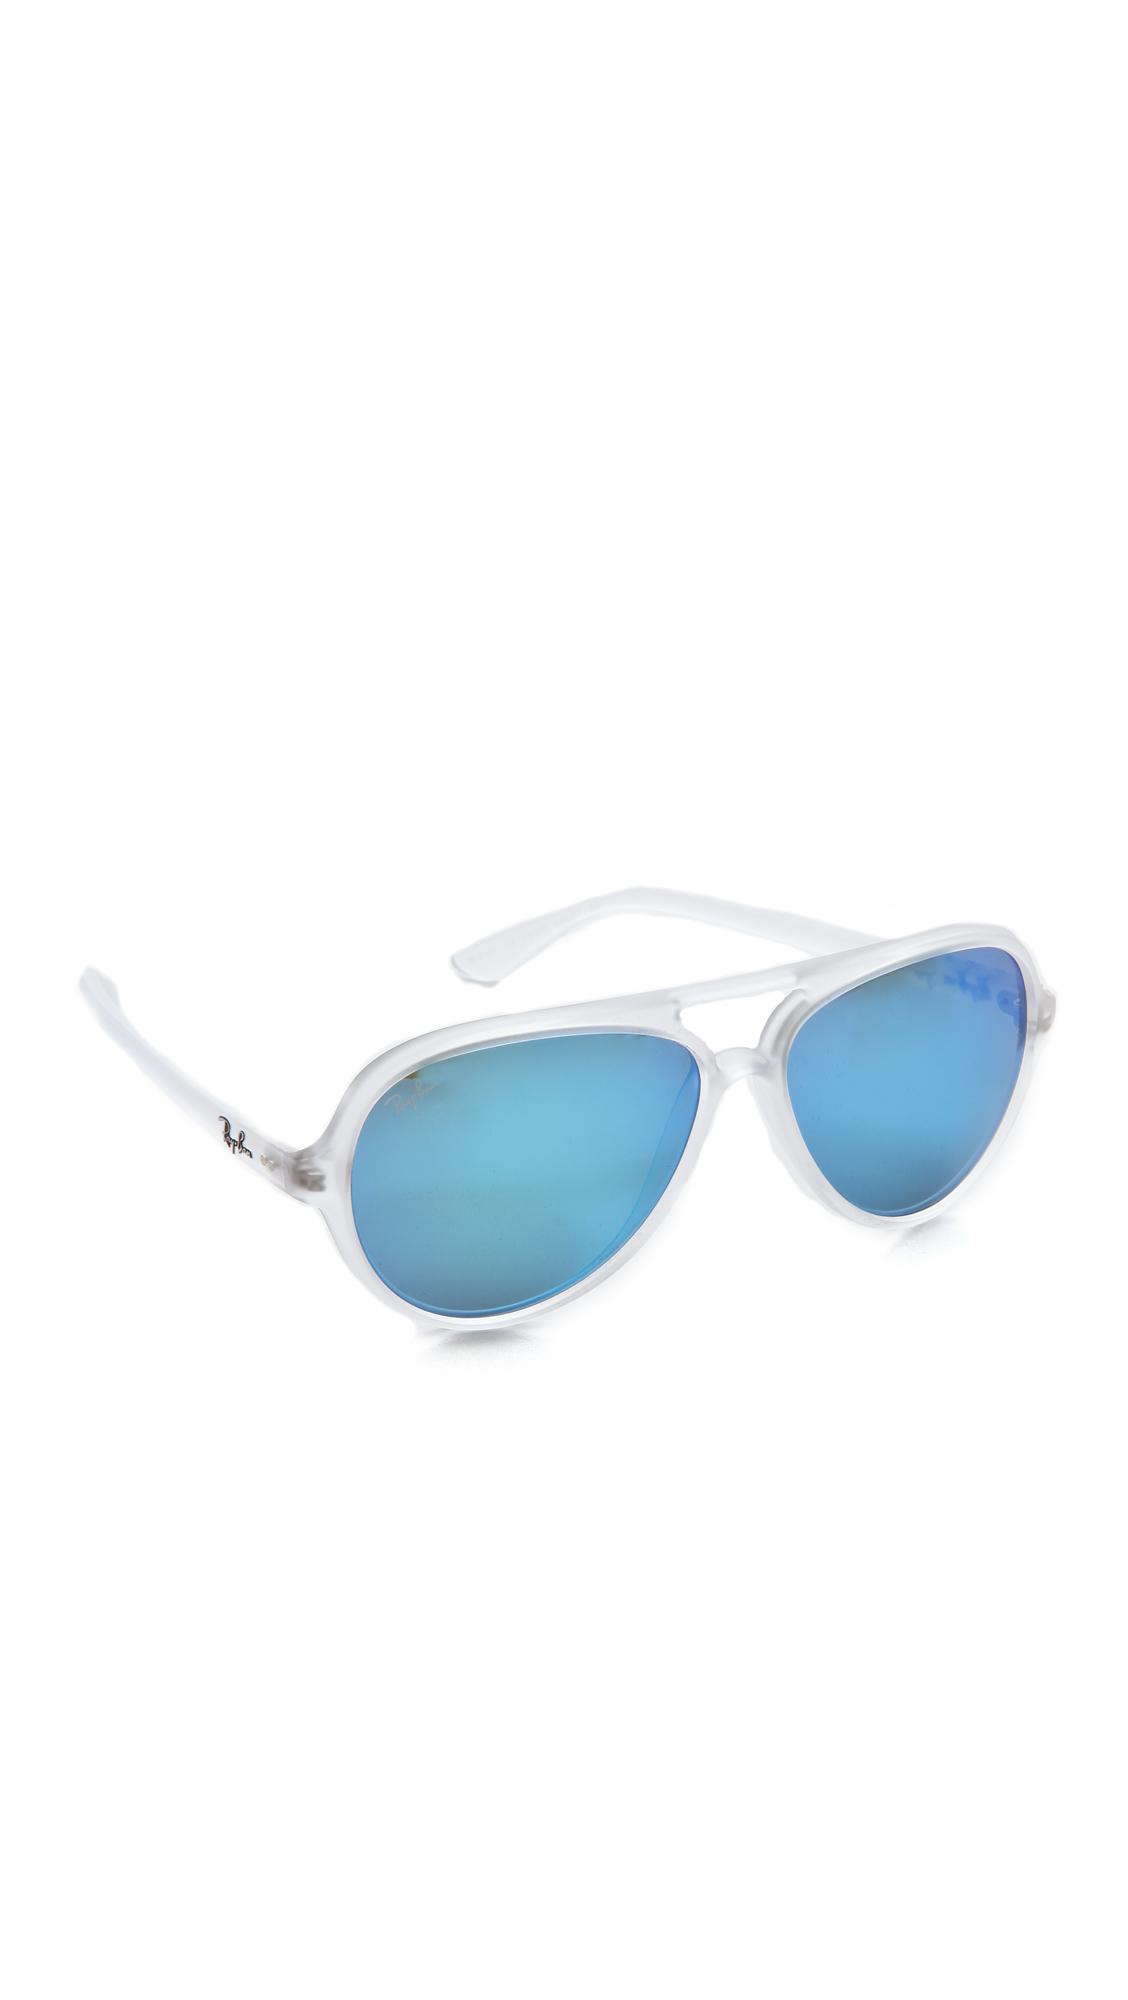 7cb25baafa73 ray-ban-matte-transparentblue-mirror-mirrored-cats-aviator-sunglasses -product-2-13536653-489560689.jpeg